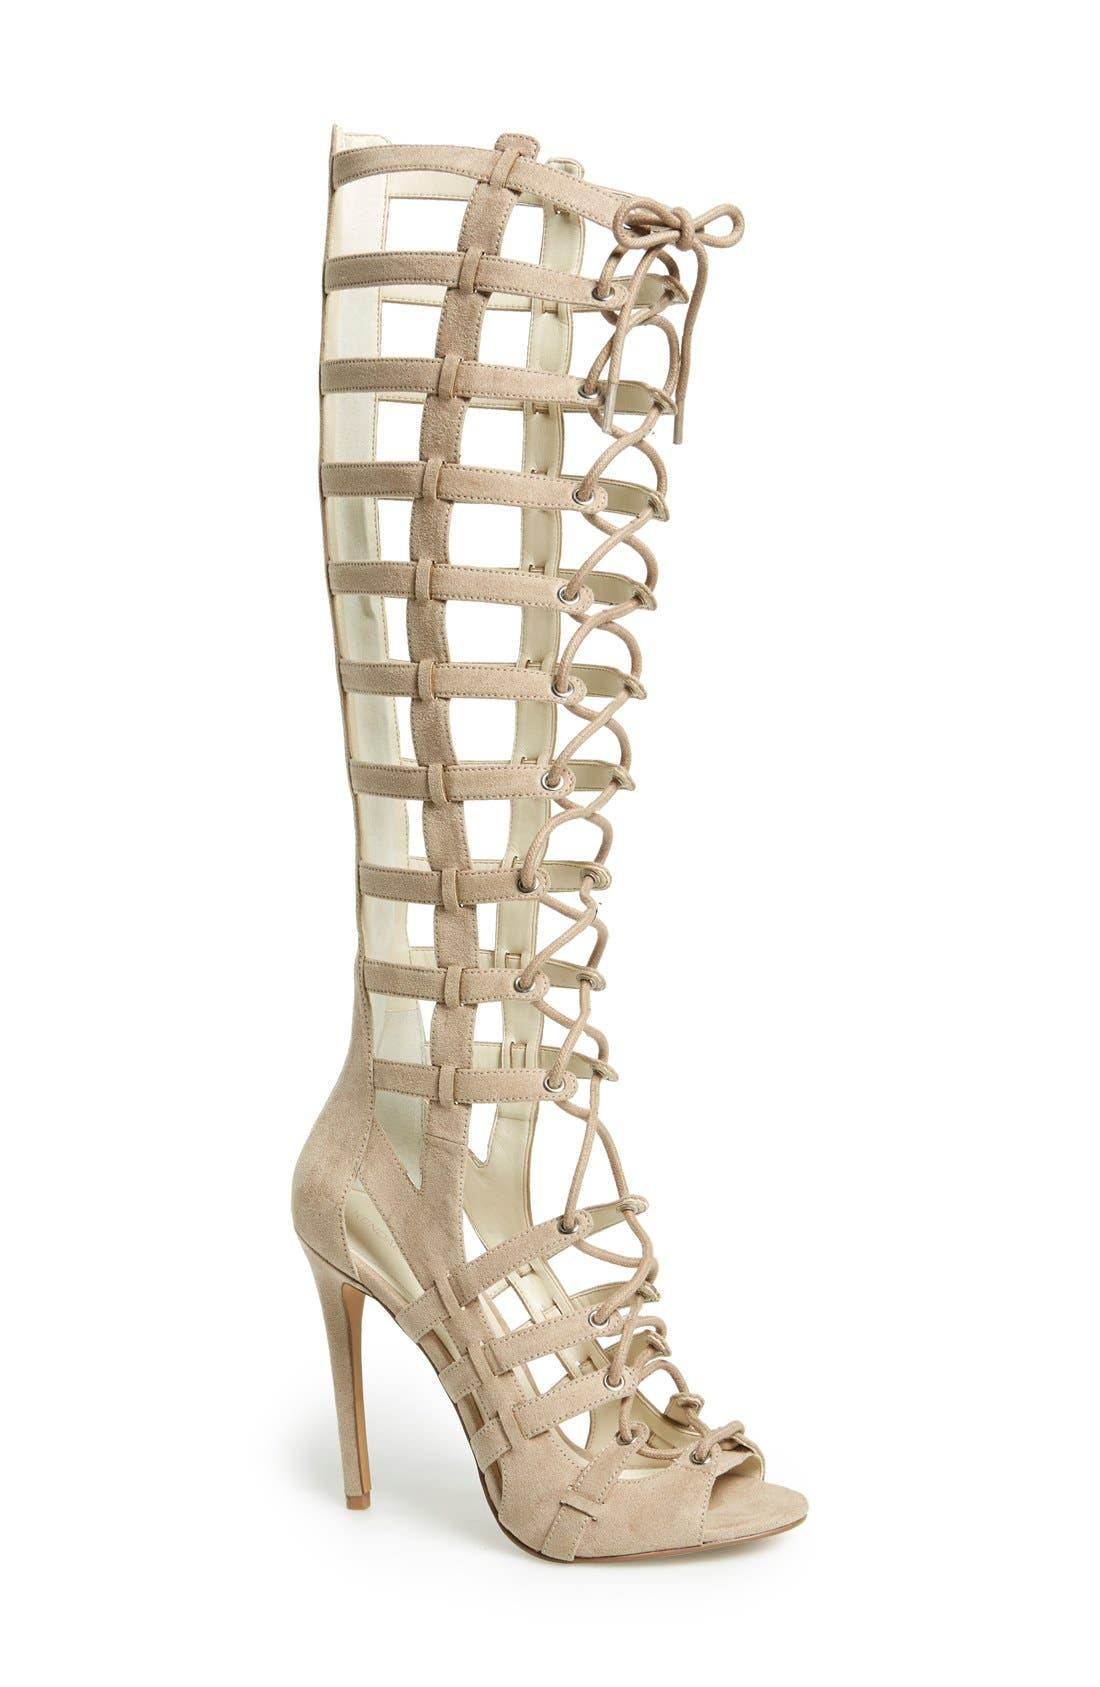 Alternate Image 1 Selected - KENDALL + KYLIE 'Emily' Tall Gladiator Sandal (Women)